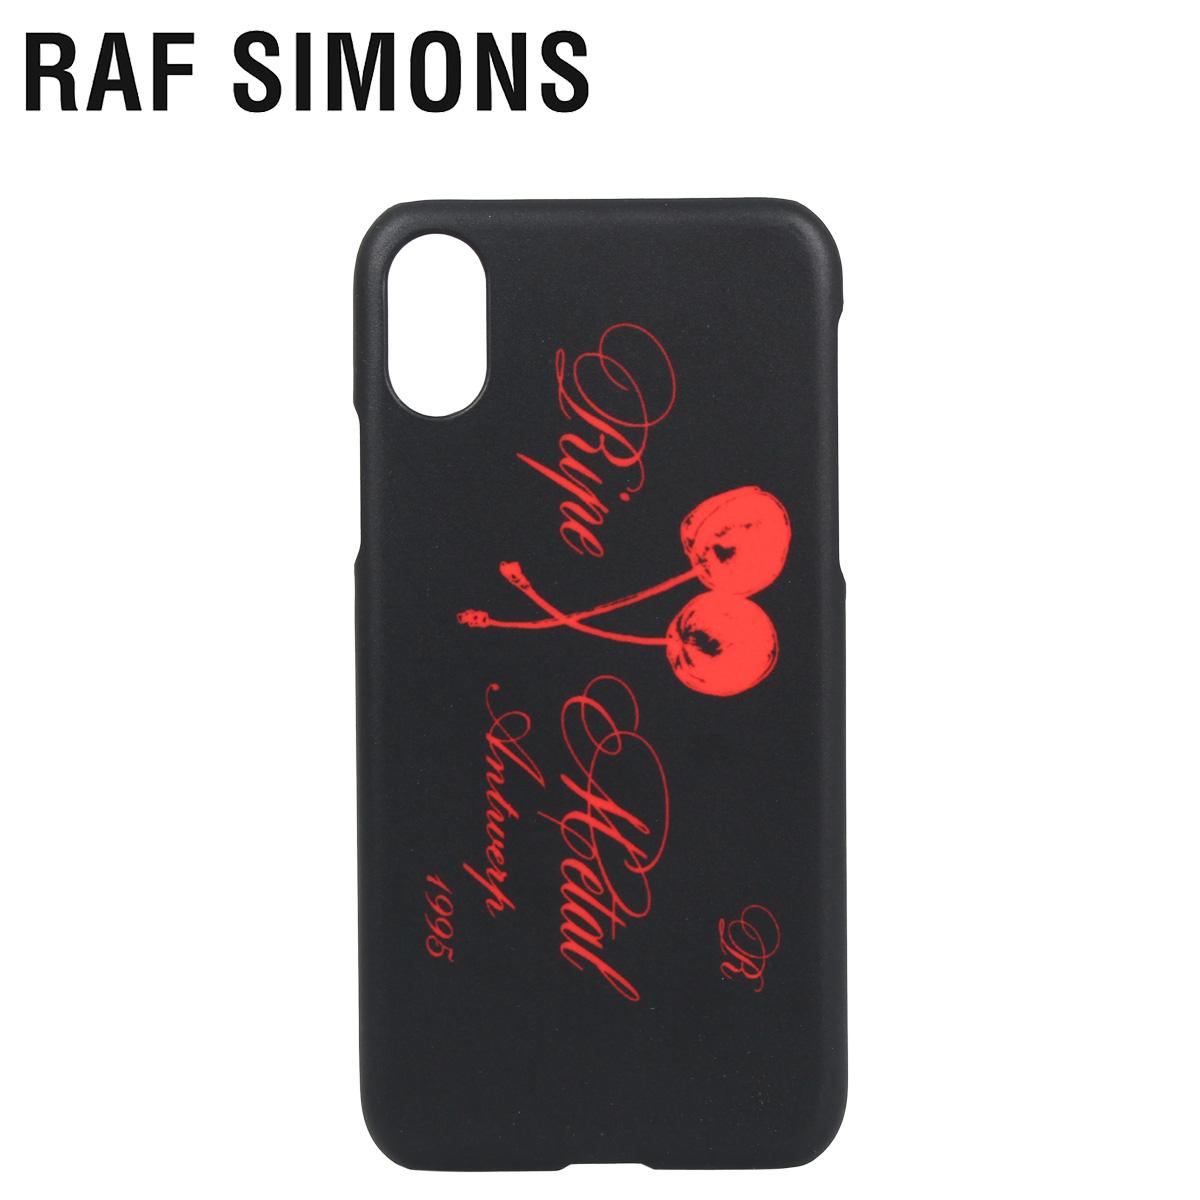 RAF SIMONS ラフシモンズ iPhone XS X ケース スマホ 携帯 アイフォン メンズ レディース IPHONE CASE ブラック 黒 192-942